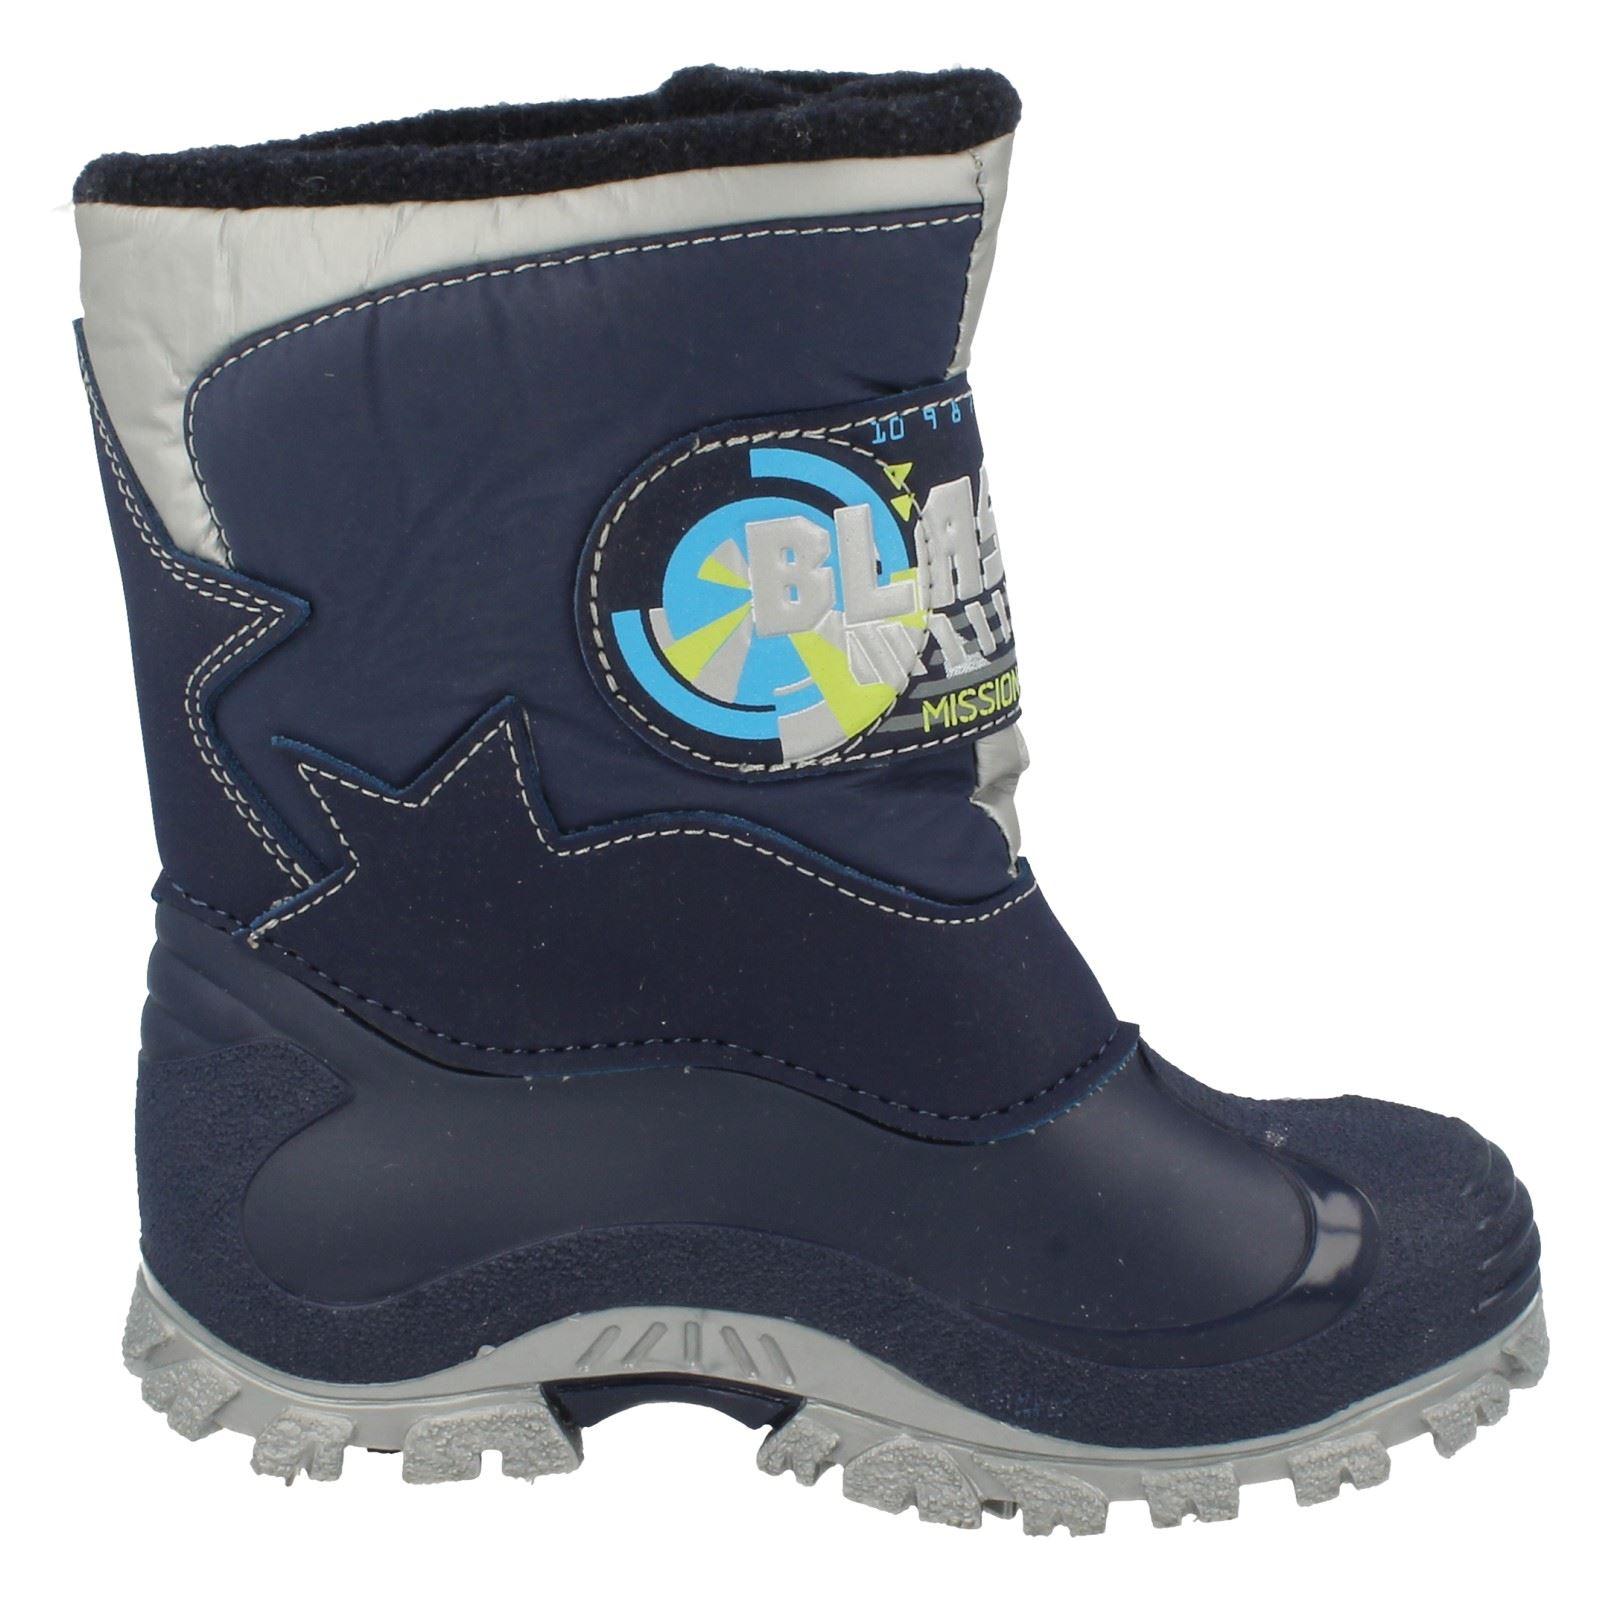 Boys Startrite Blast Off Snow Boots